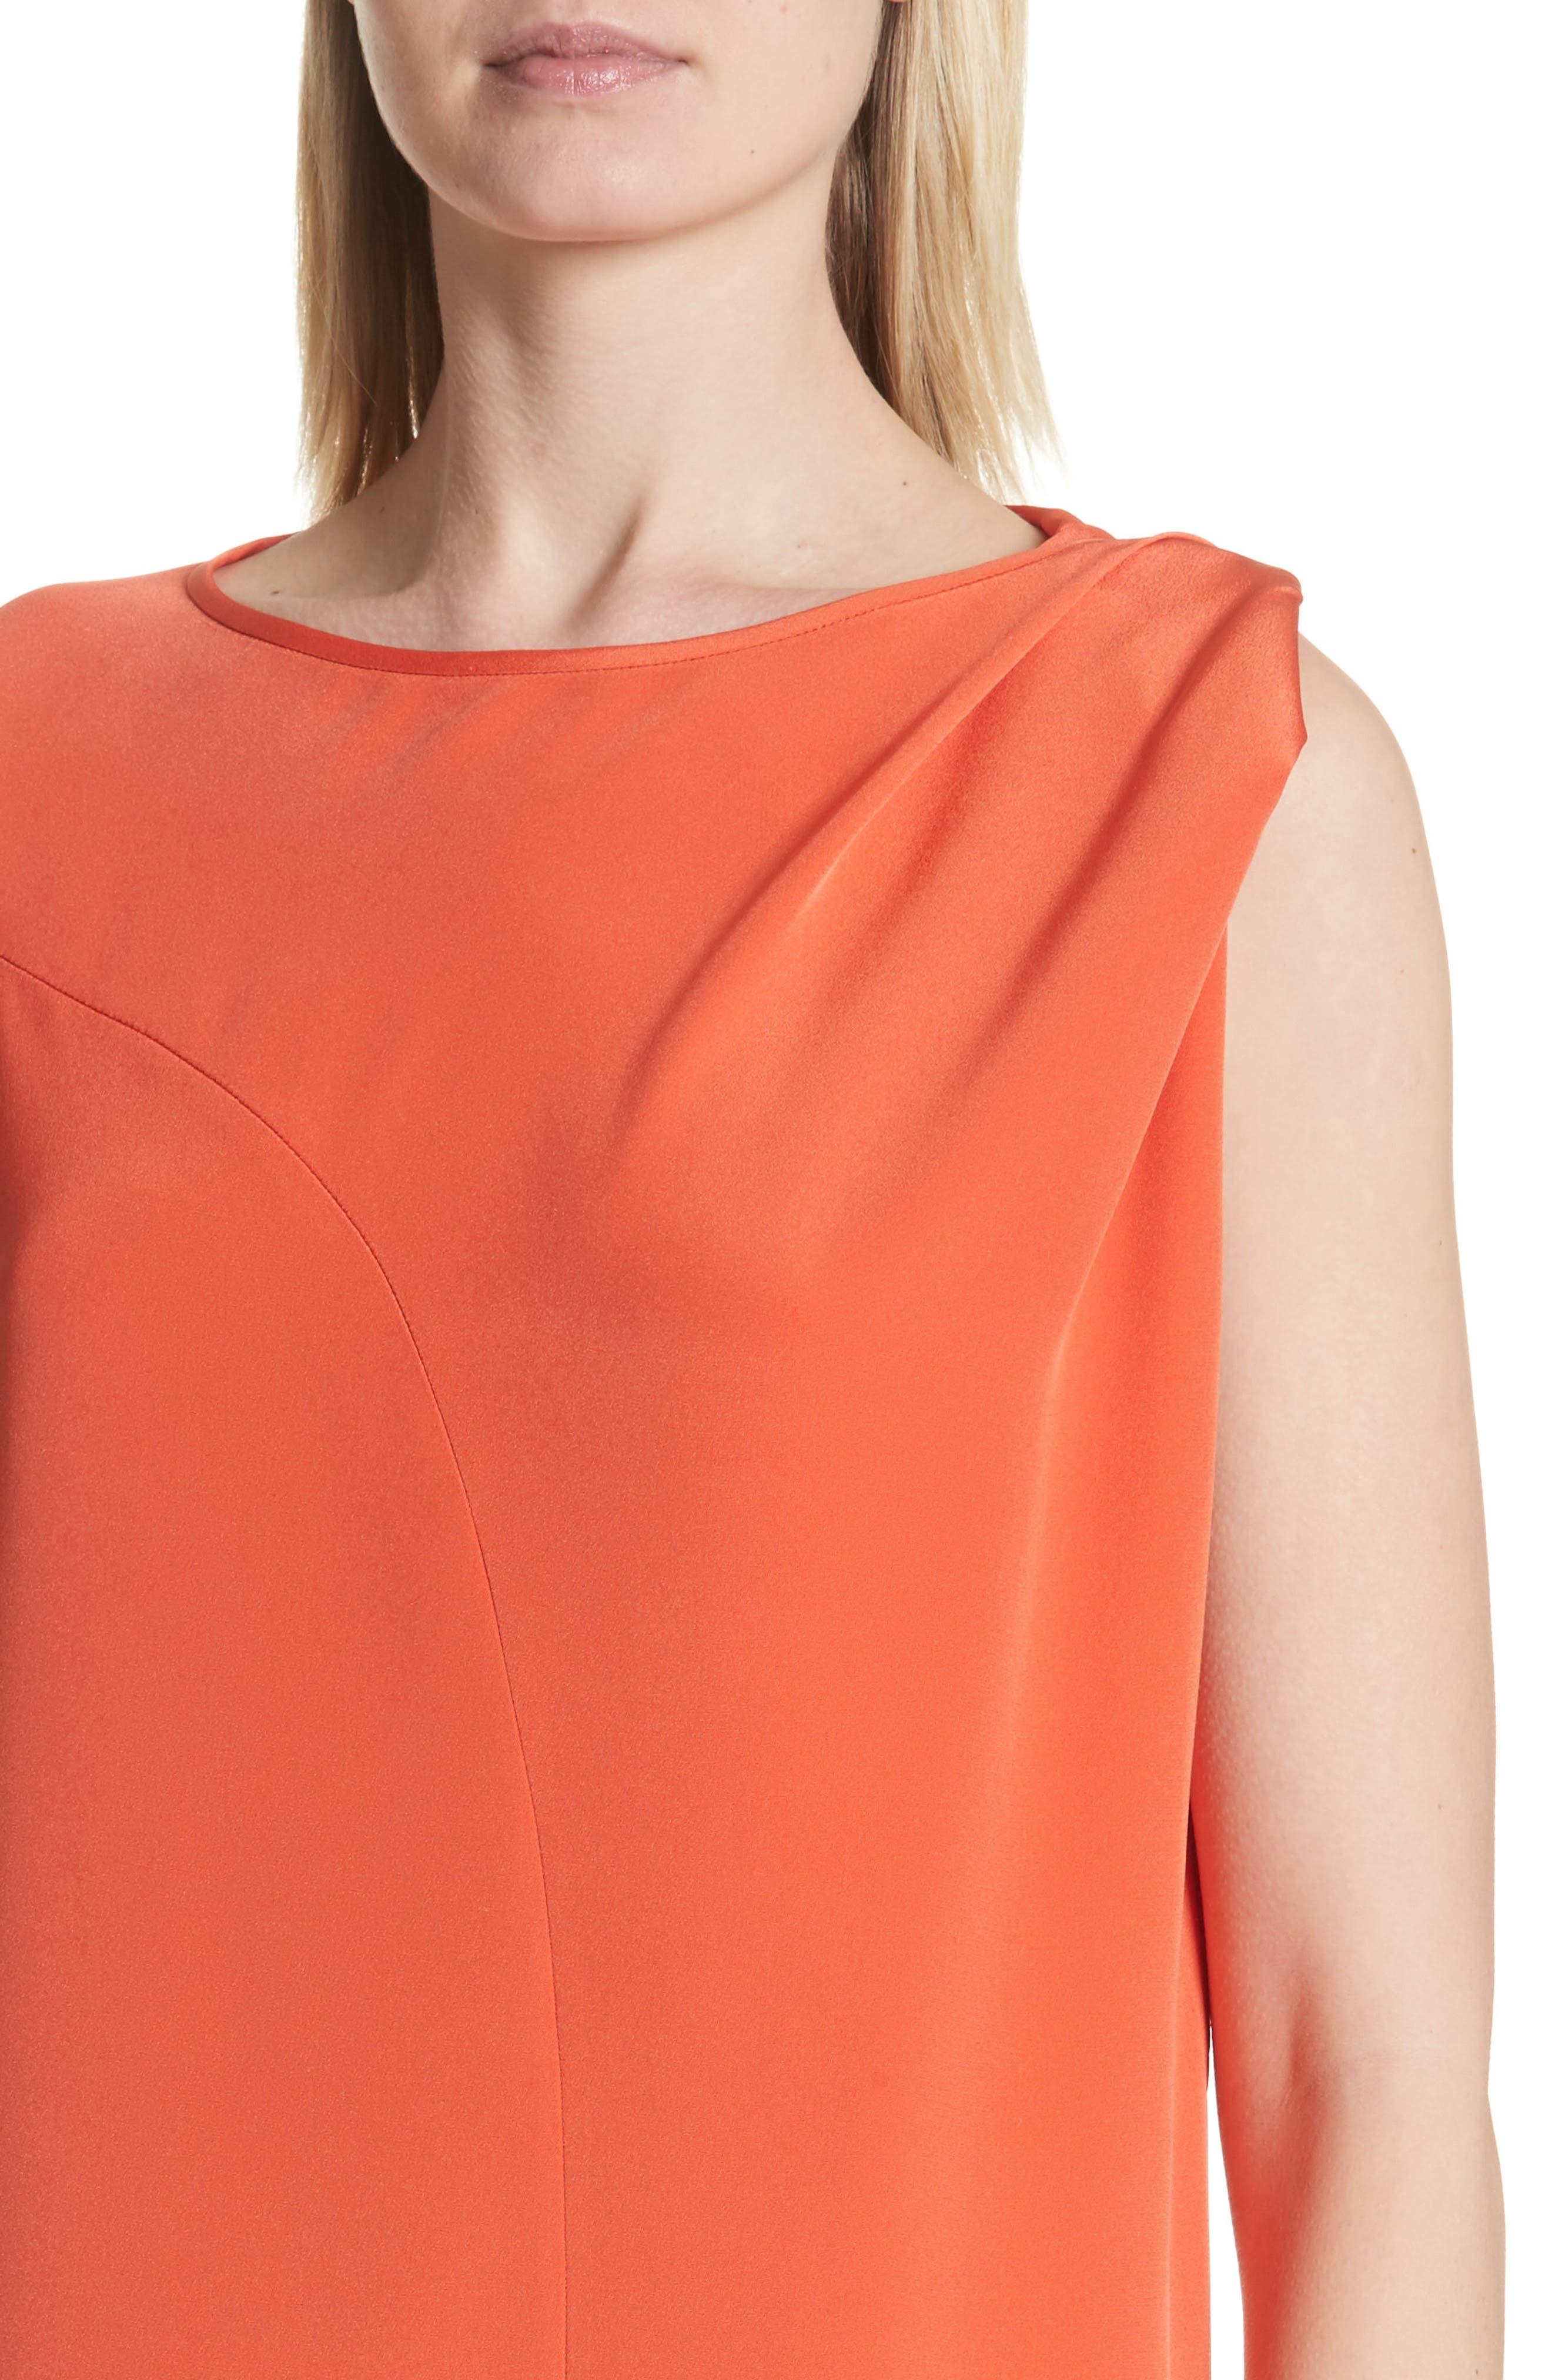 ZERO + MARIA CORNEJO,                             Twist Detail Silk Dress,                             Alternate thumbnail 4, color,                             840